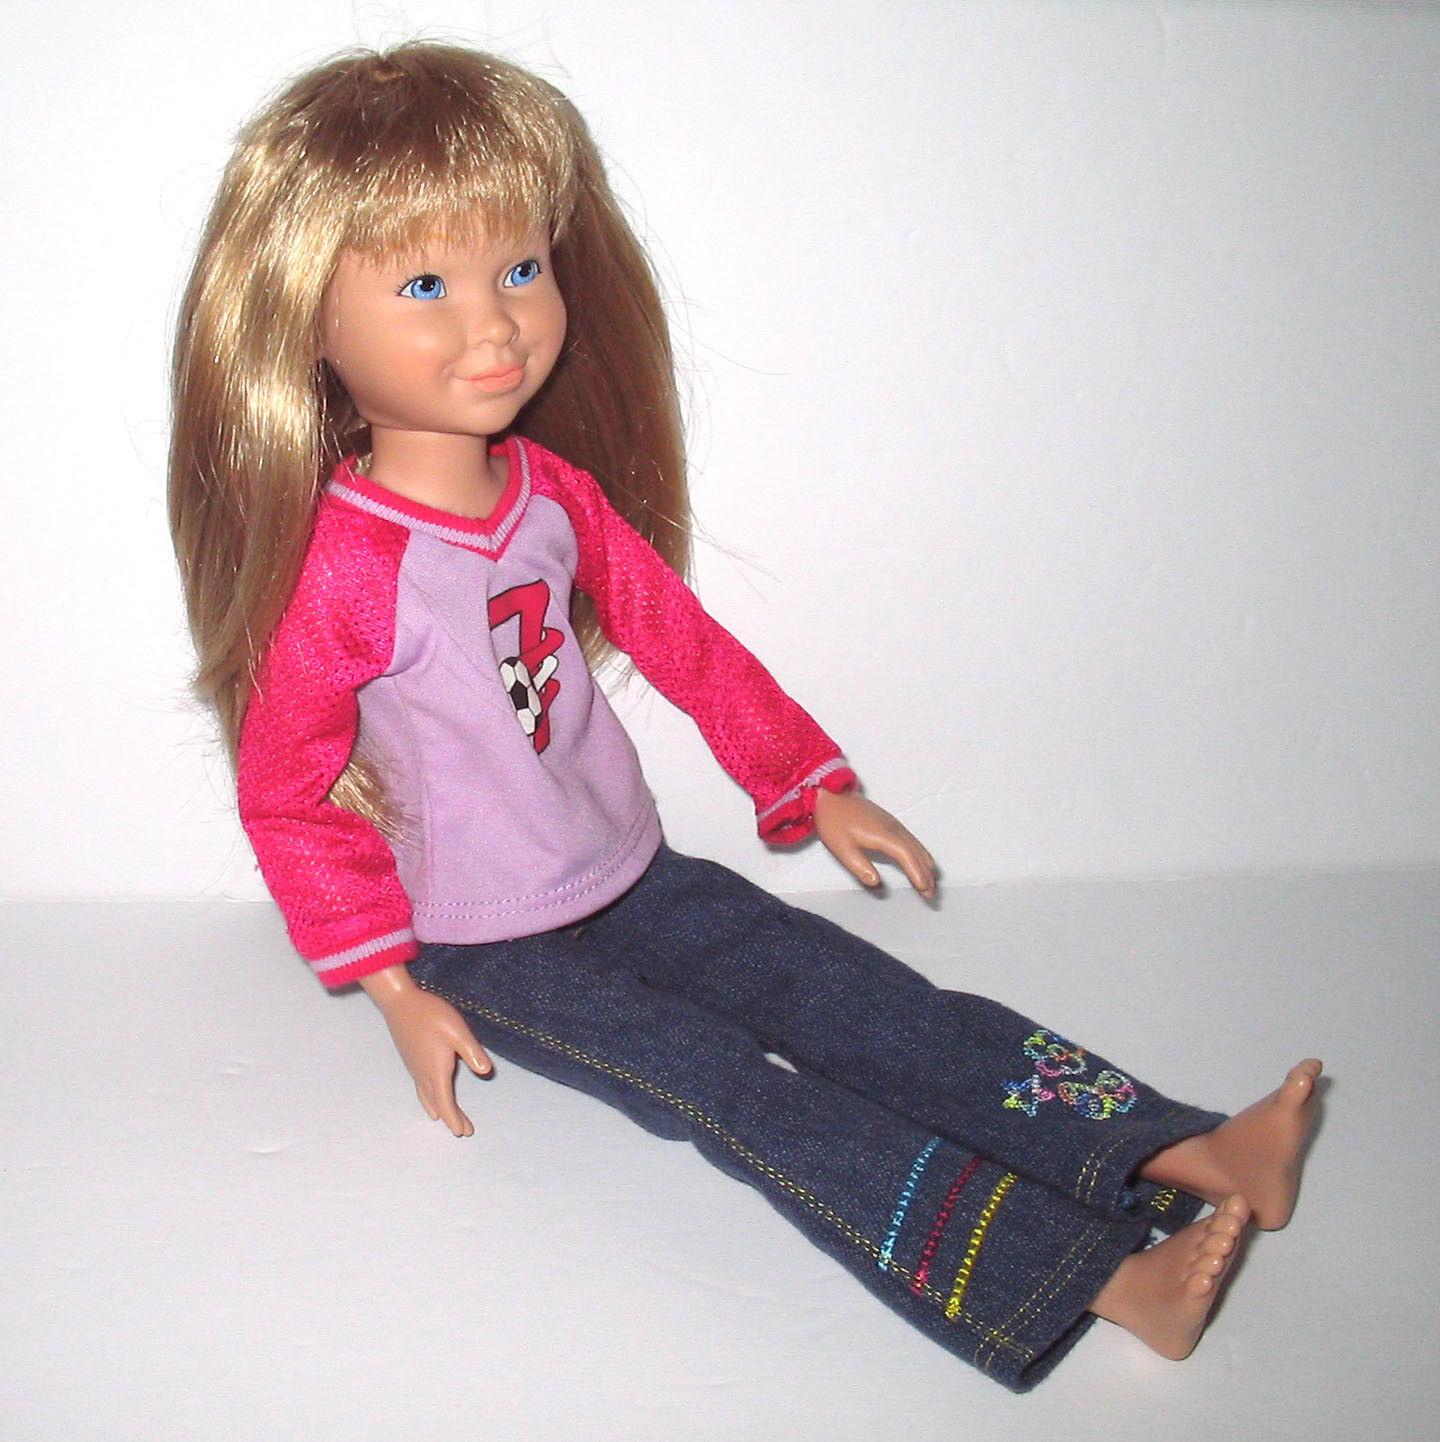 16  American Girl Pleasant Company Company Company Hopscotch Hill Doll Lot 2003 2d9baf